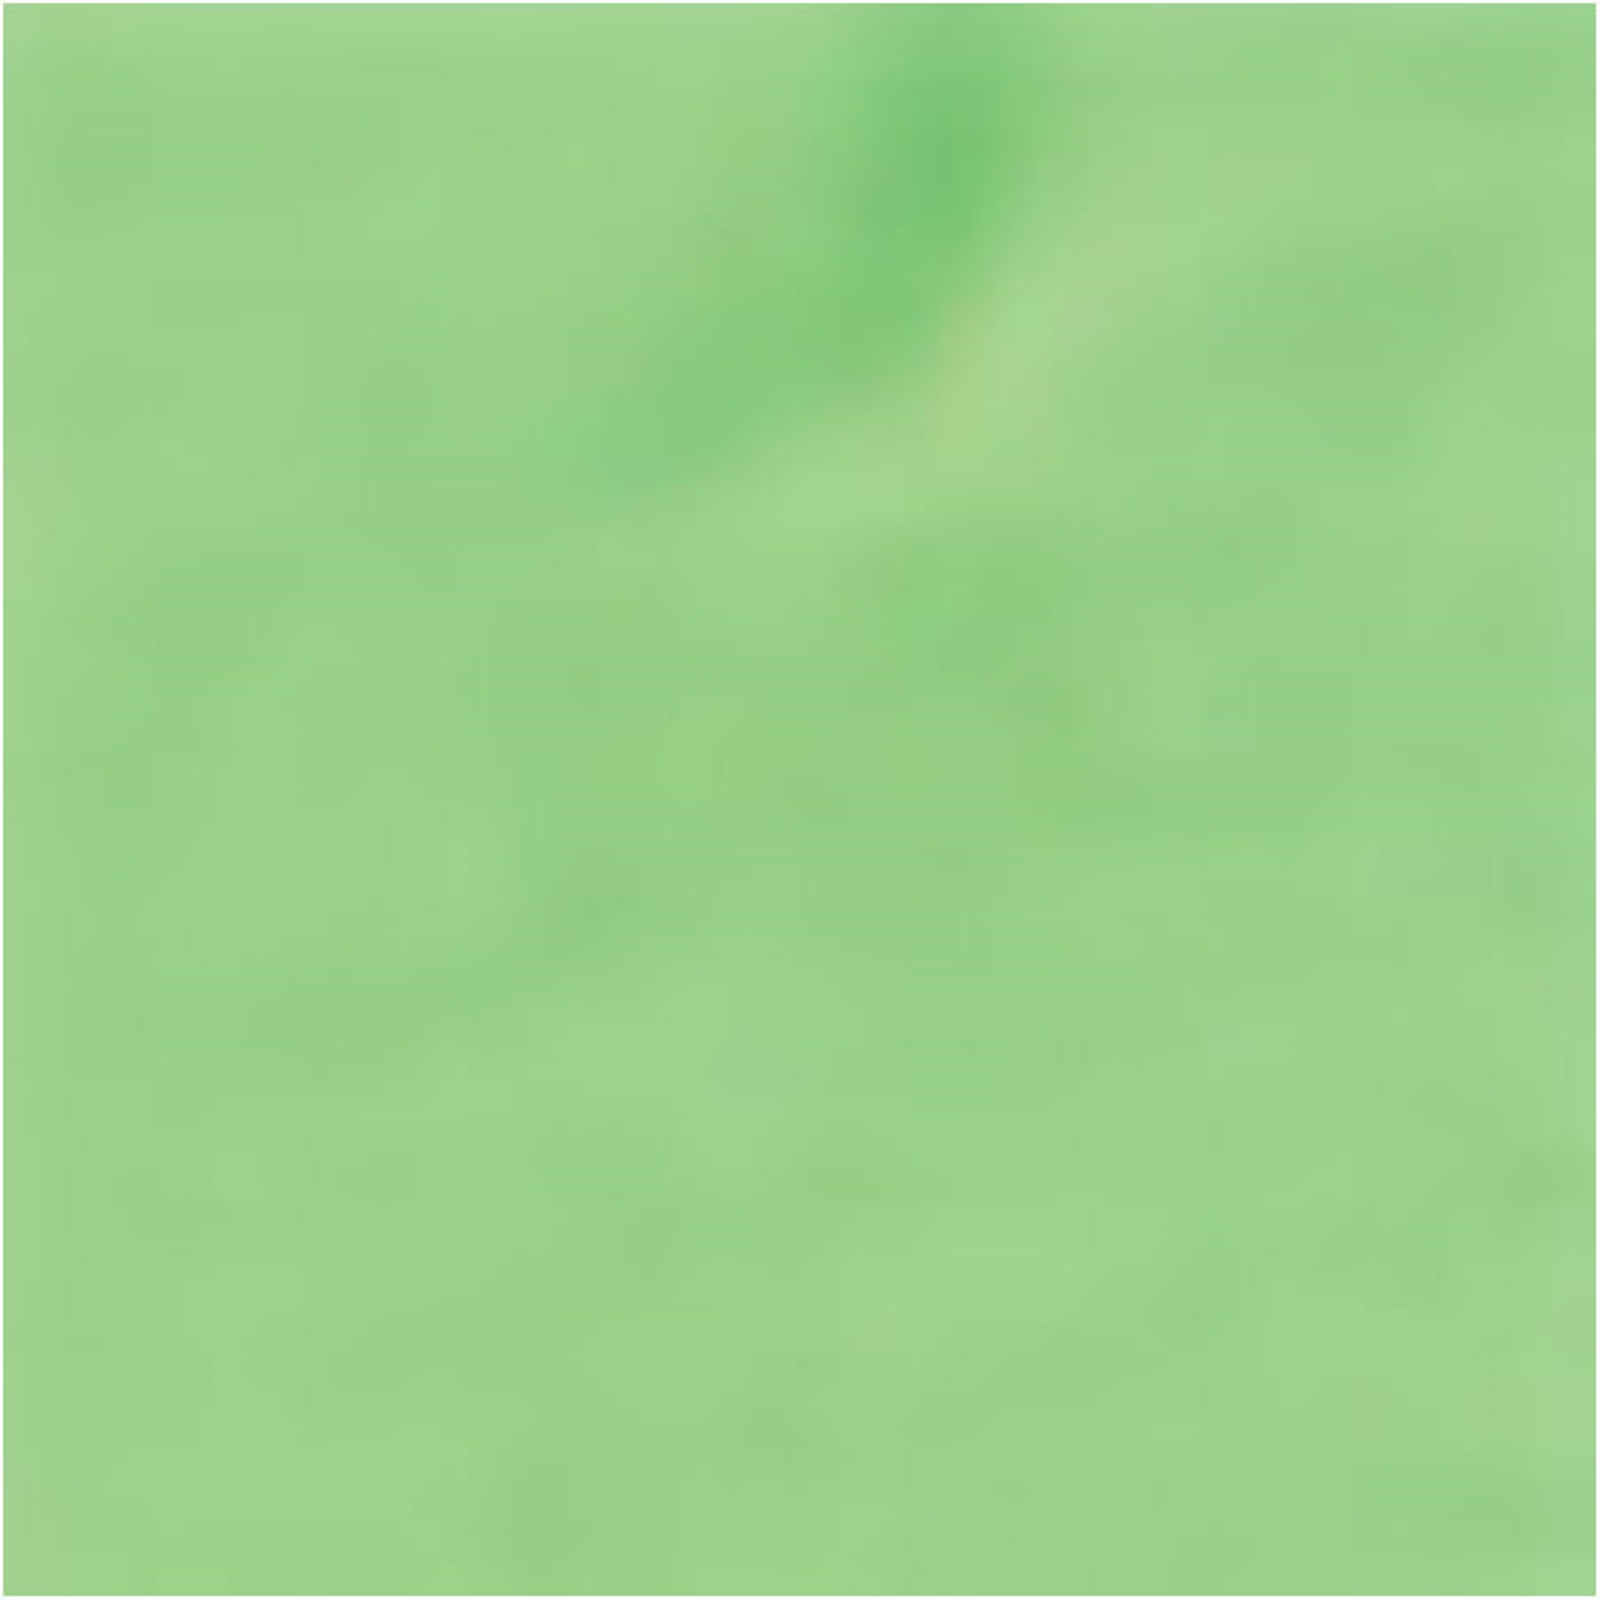 verde fosforescent